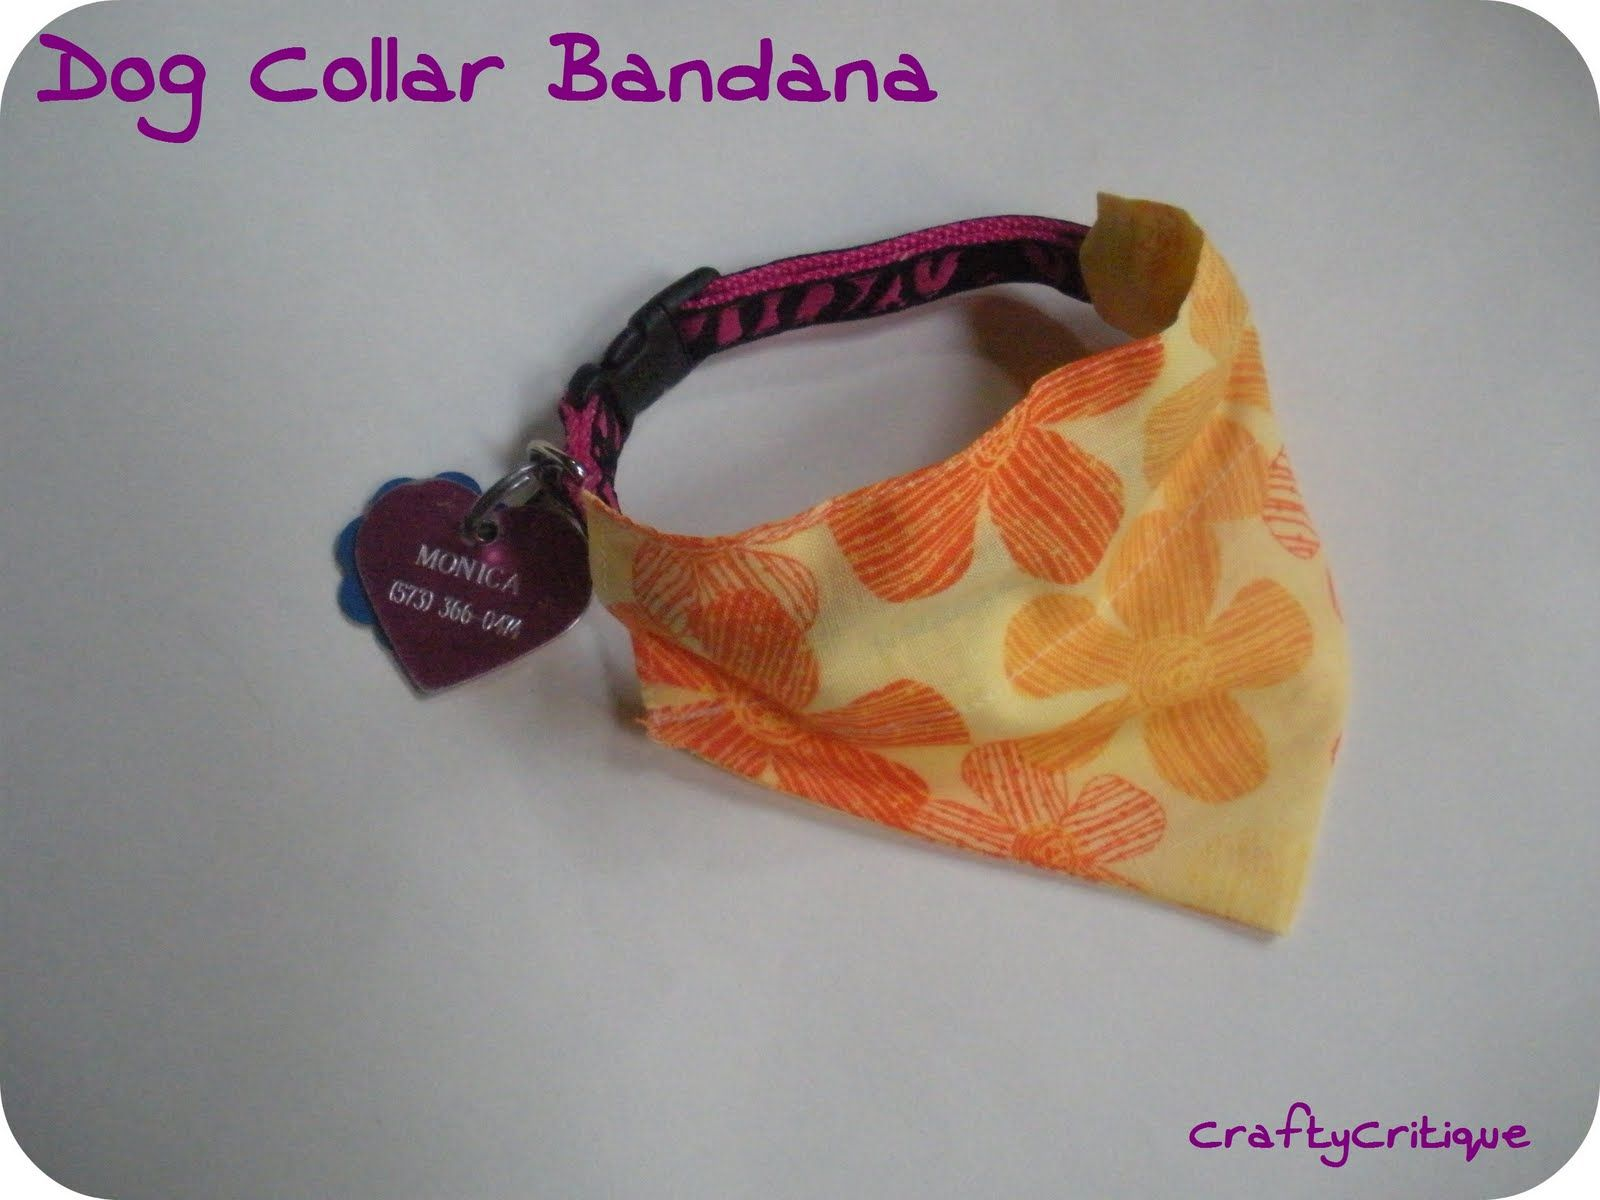 Crafty critique tutorial slide on dog collar bandana sewing crafty critique tutorial slide on dog collar bandana jeuxipadfo Gallery